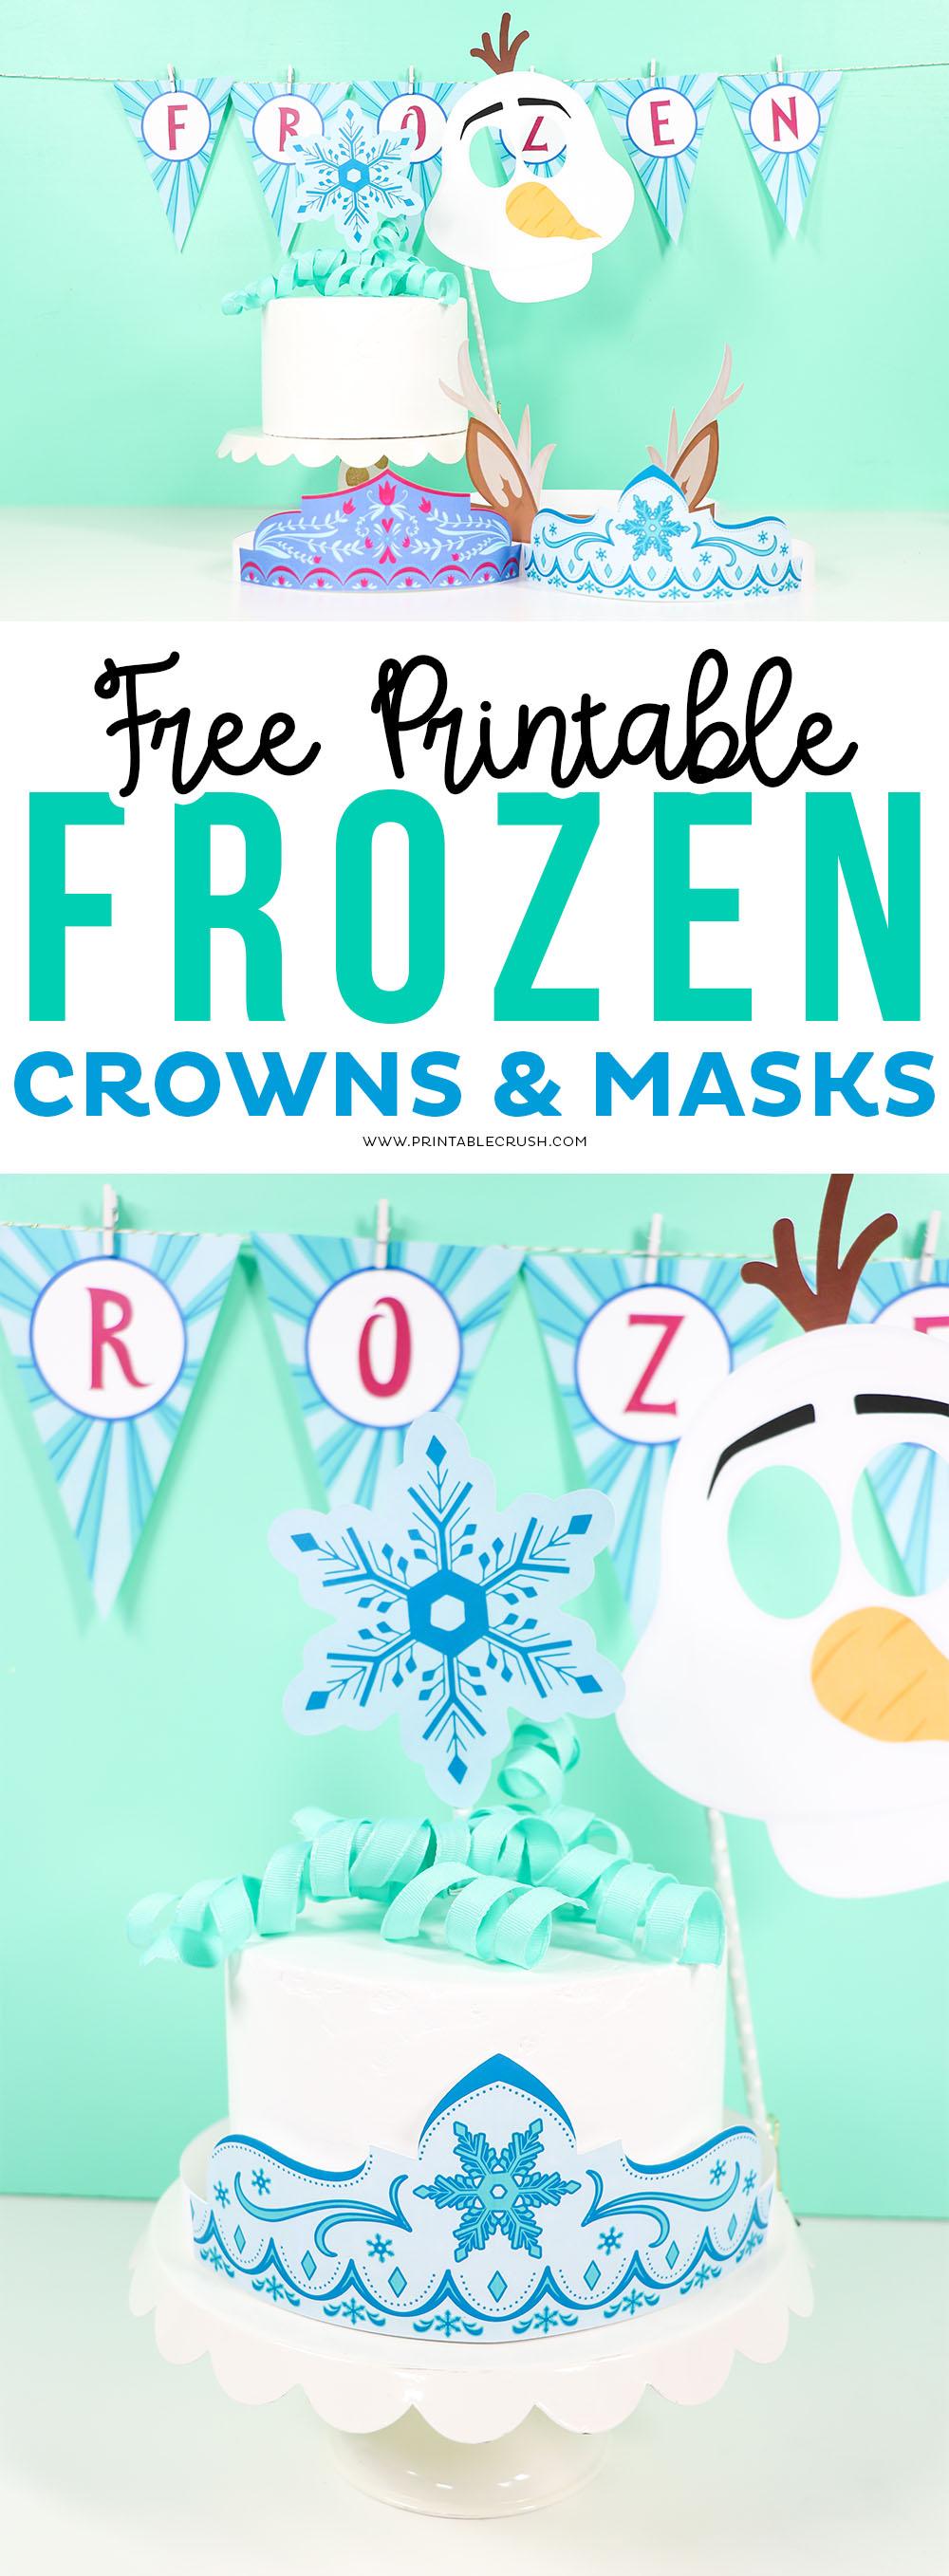 FREE Frozen Party Printables #frozen2 #frozenprintables #frozenparty #olaf #sven #partyideas #partyprintables #frozenpartyprintables #frozenpartyideas via @printablecrush